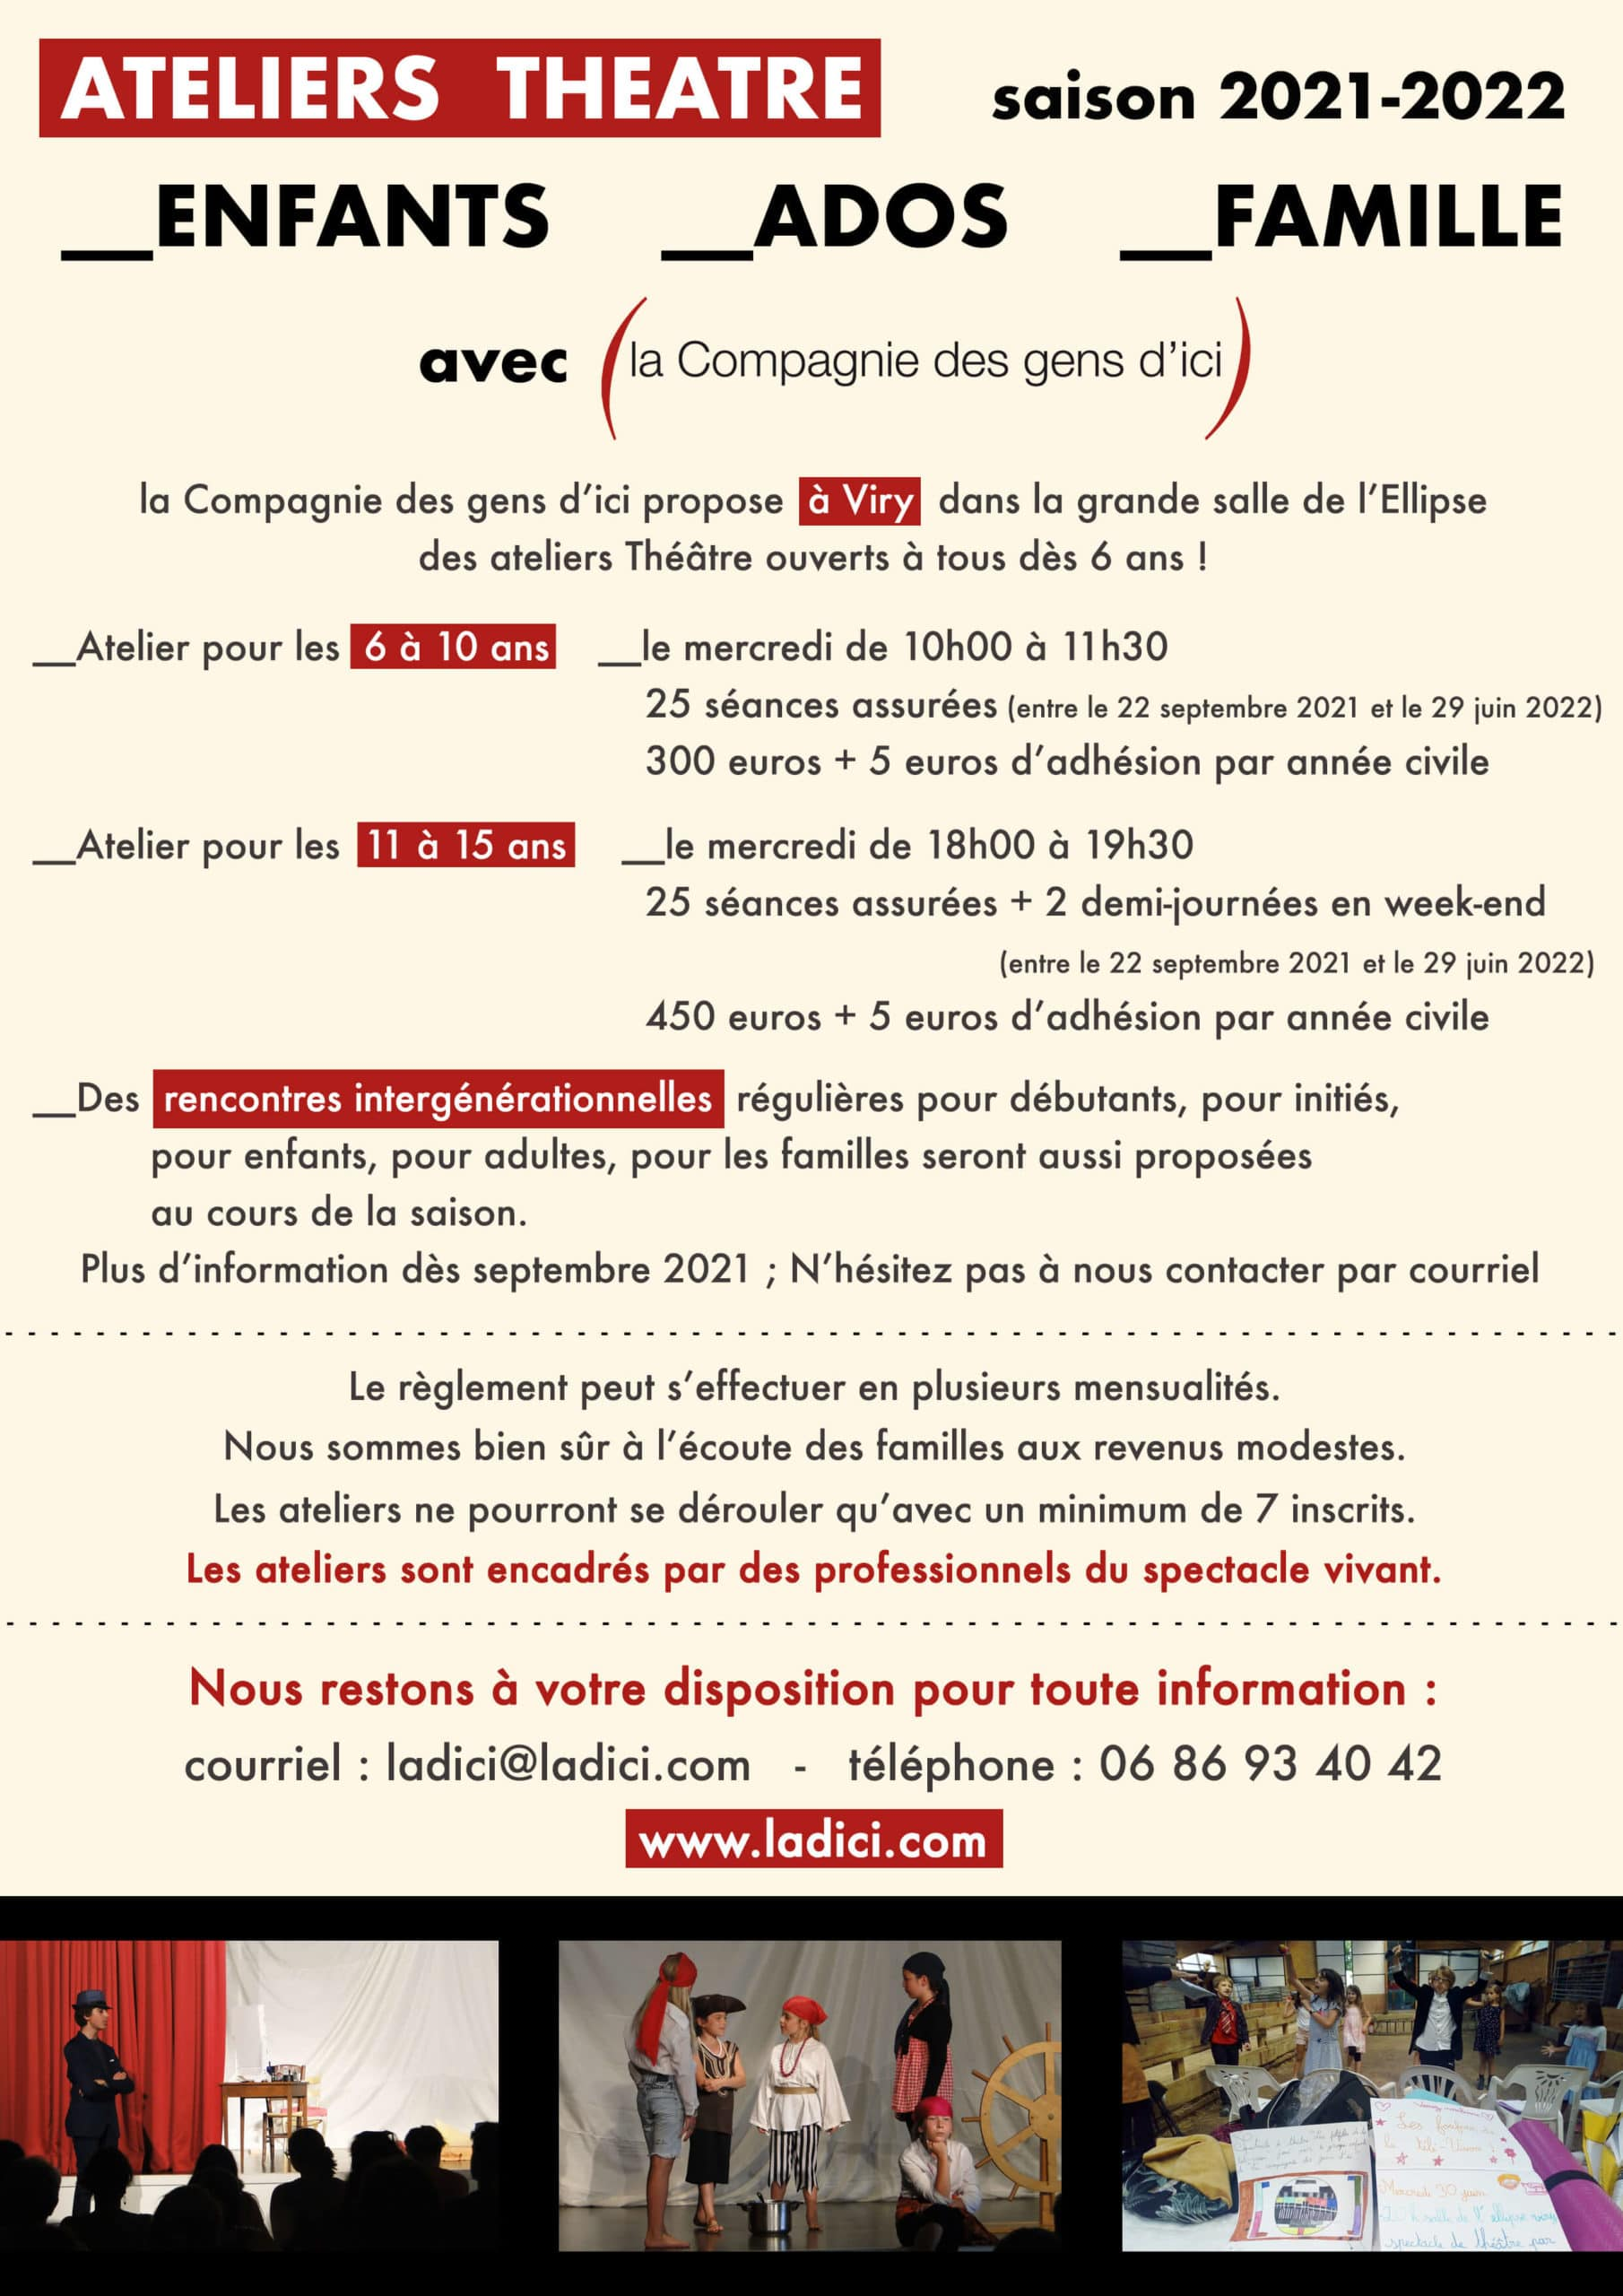 Affiche_AtelierS_Theatre_Viry_21-22